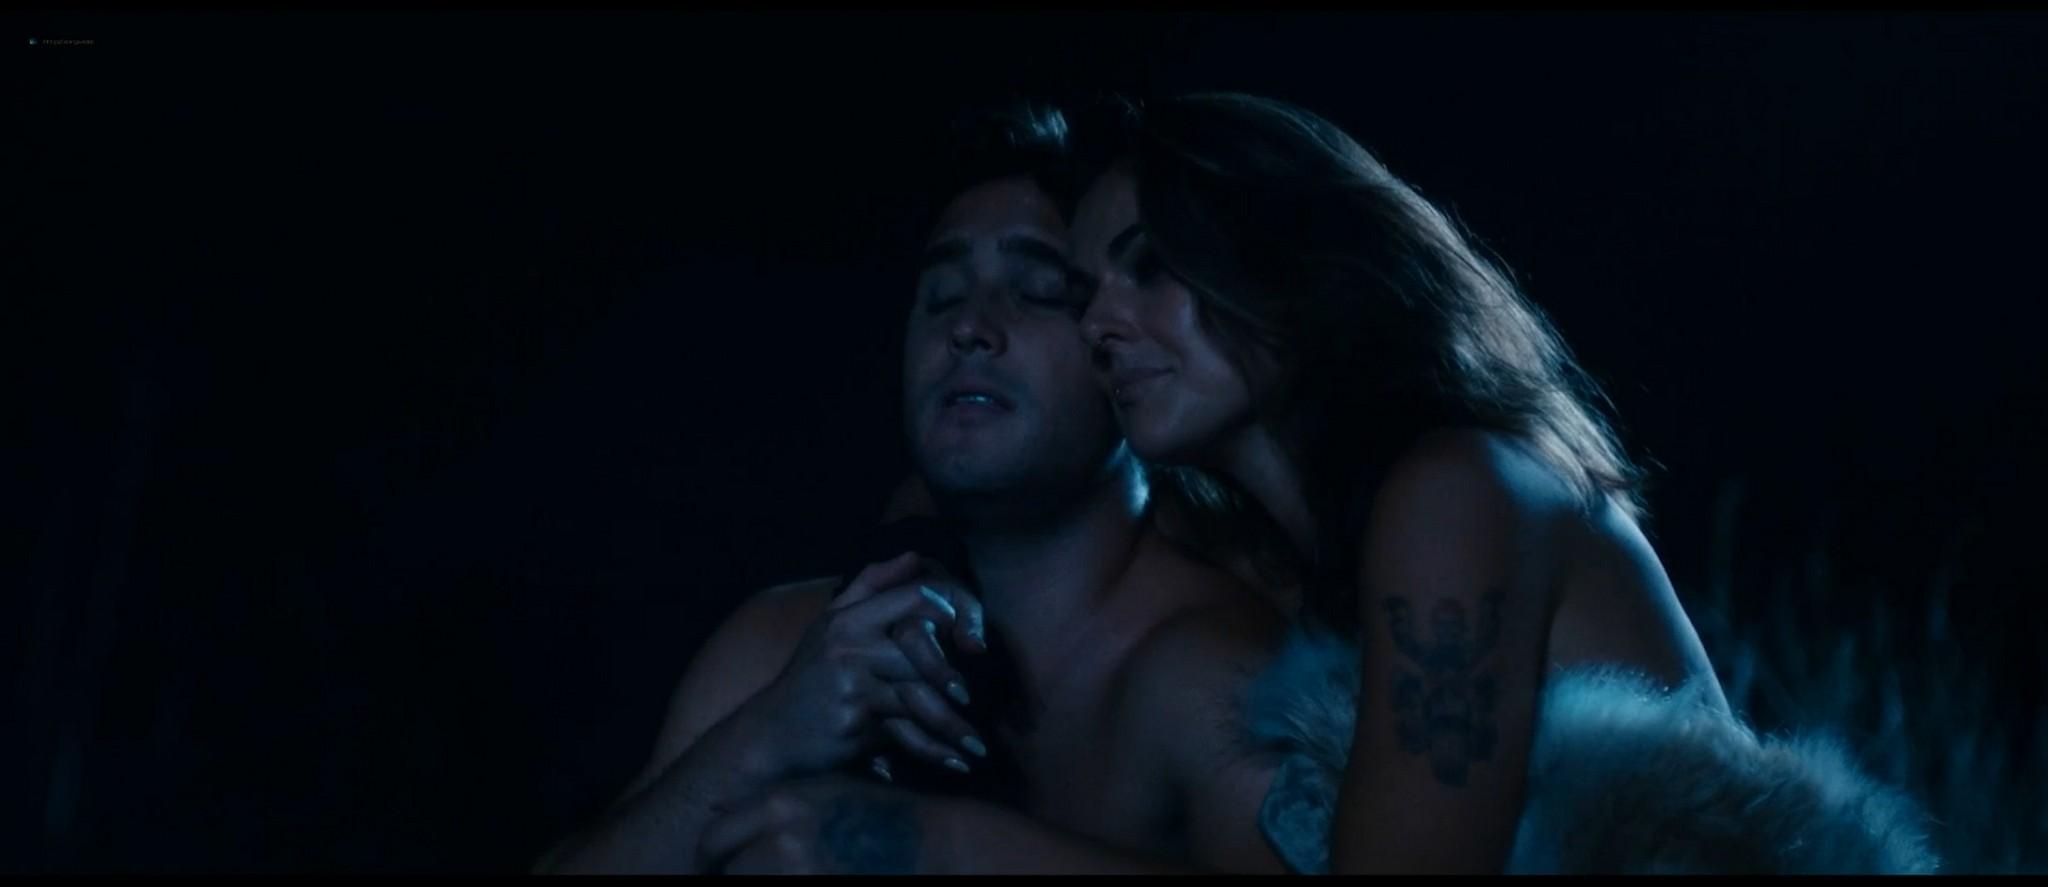 Serinda Swan hot and some sex - Revenge Ride (2020) HD 1080p Web (3)